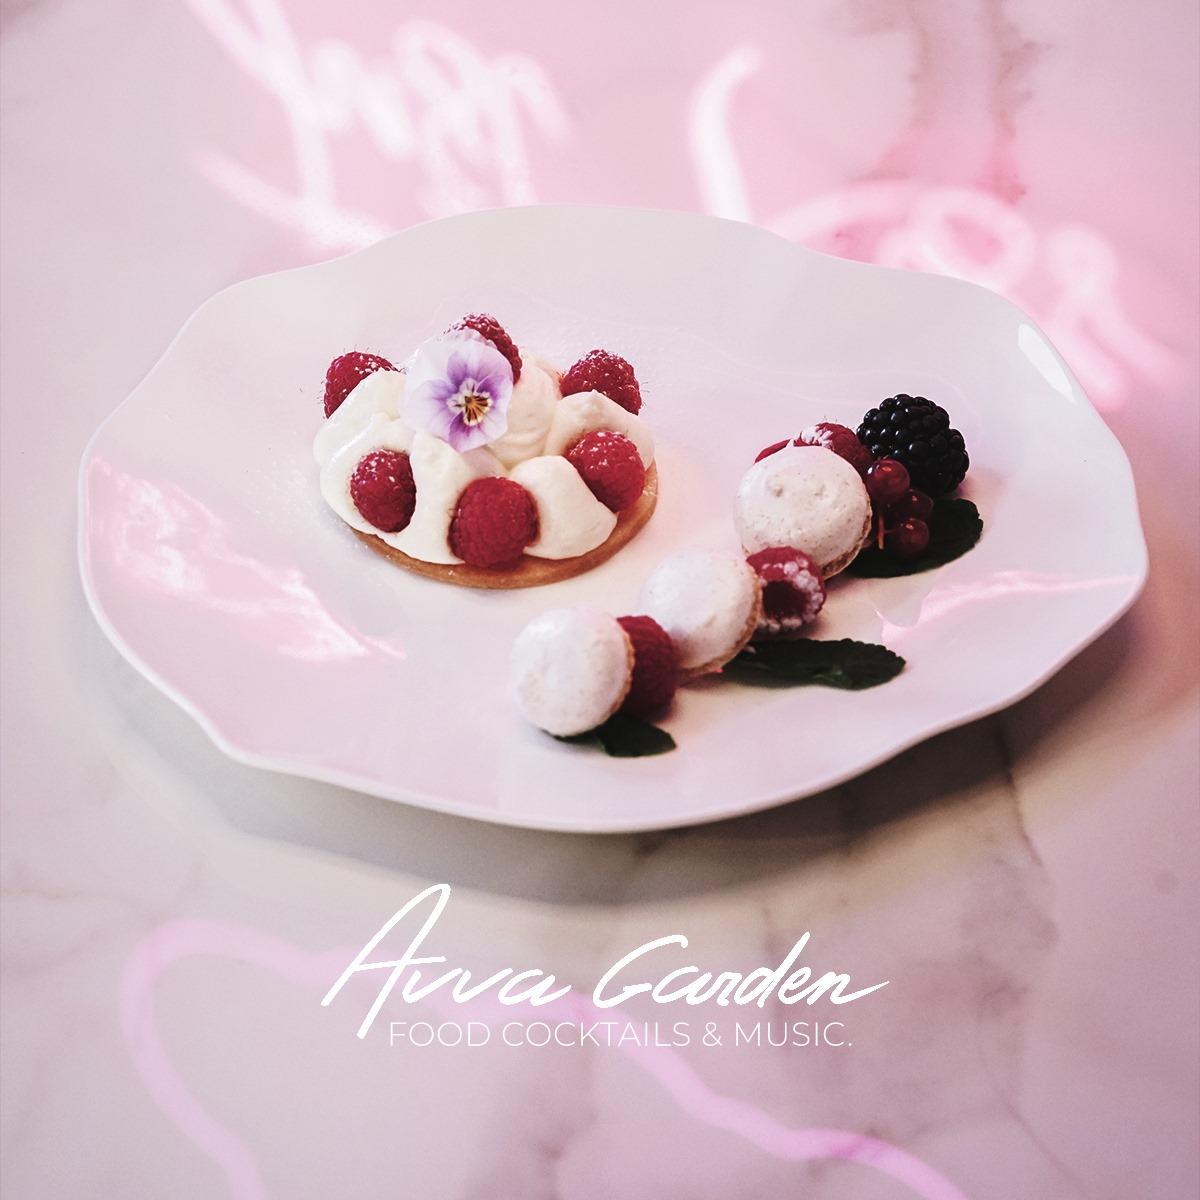 Avva-Garden-cuisine-tonique-sans-gluten